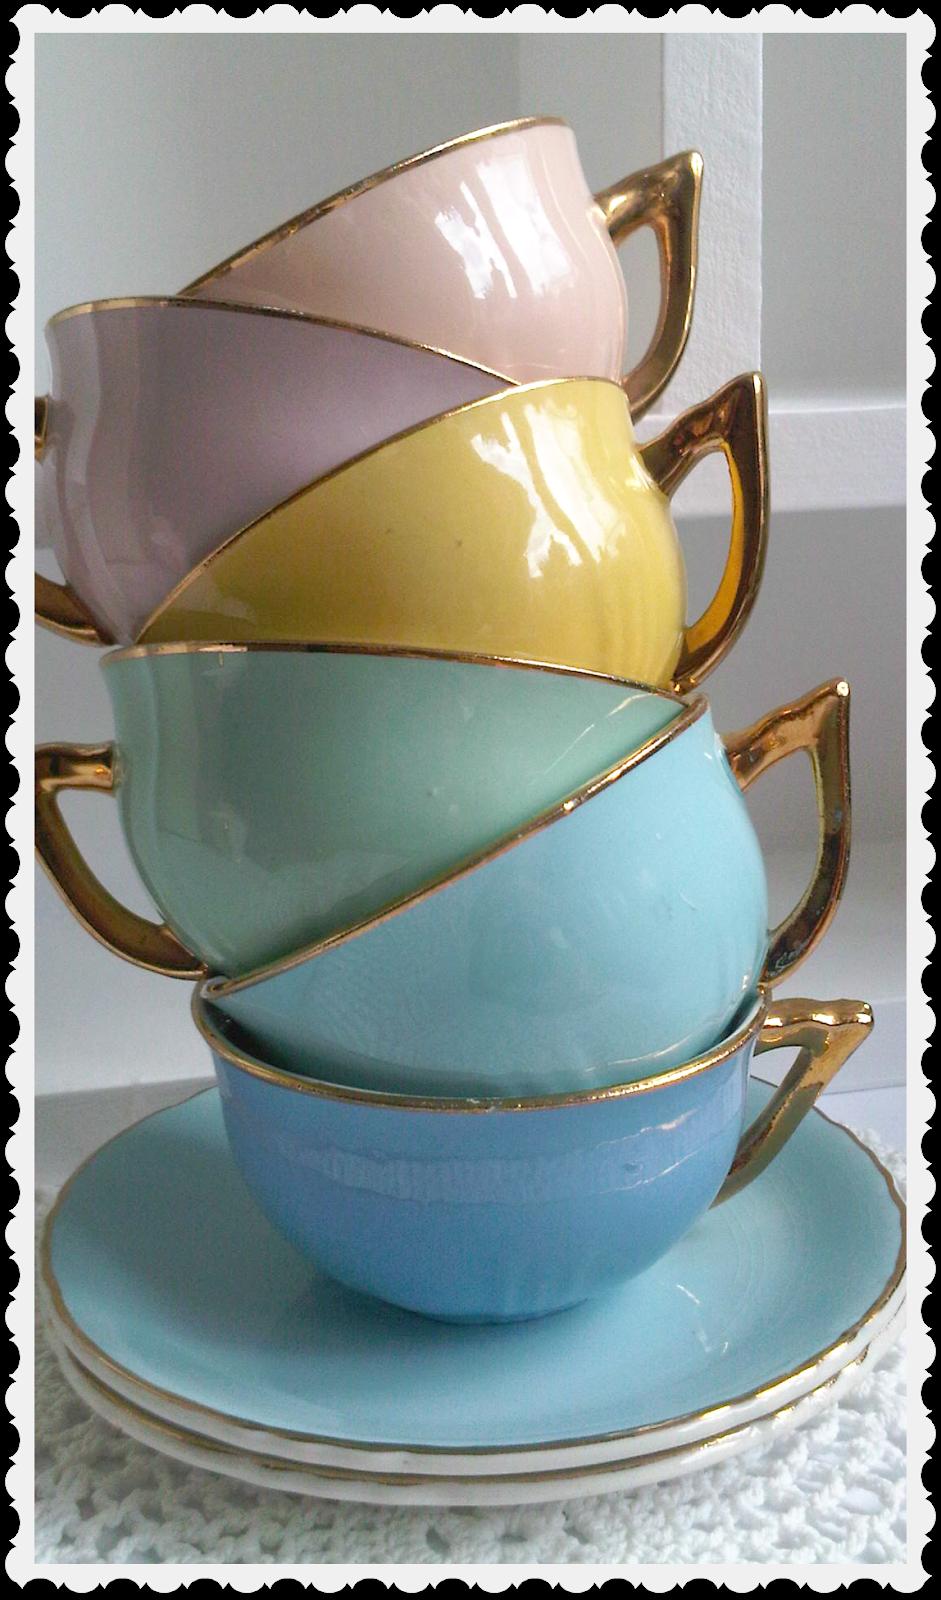 Pretty cups Coffee mugs with logo, Ceramic plates